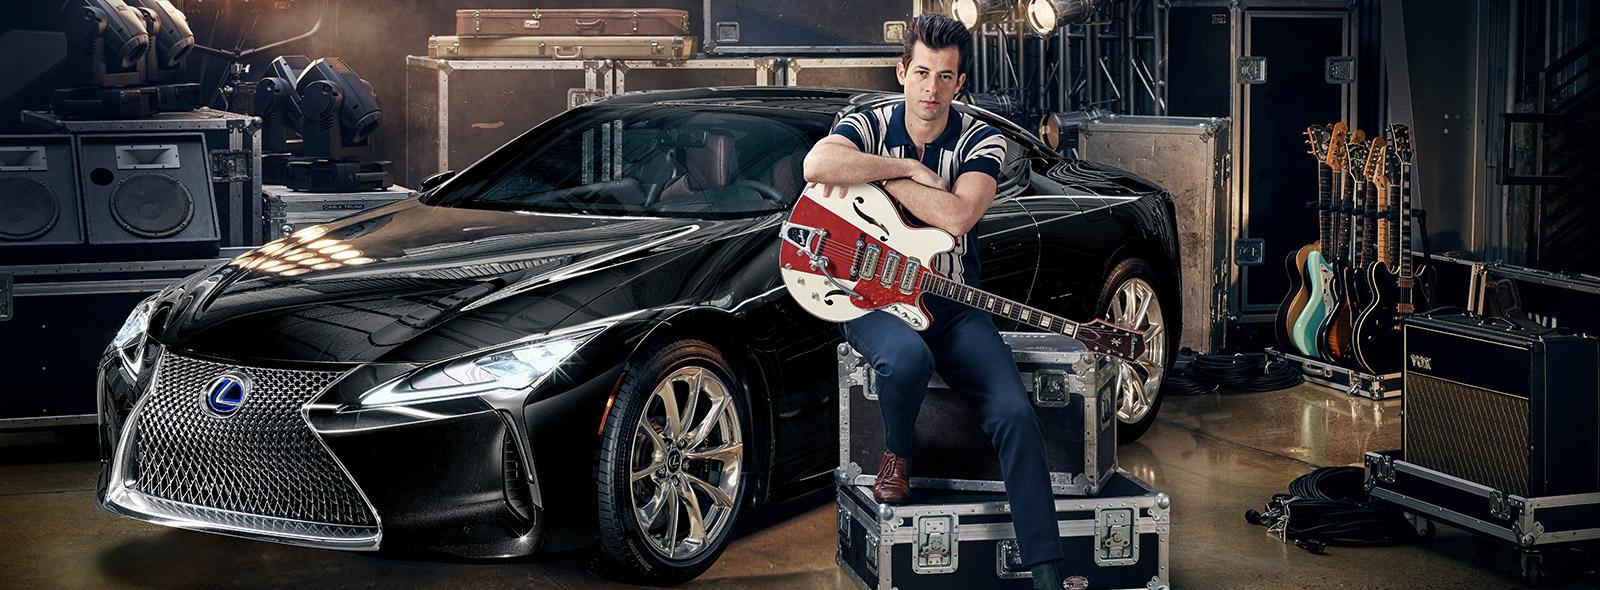 Mark Ronson med gitarr framför svart Lexus LC 500h